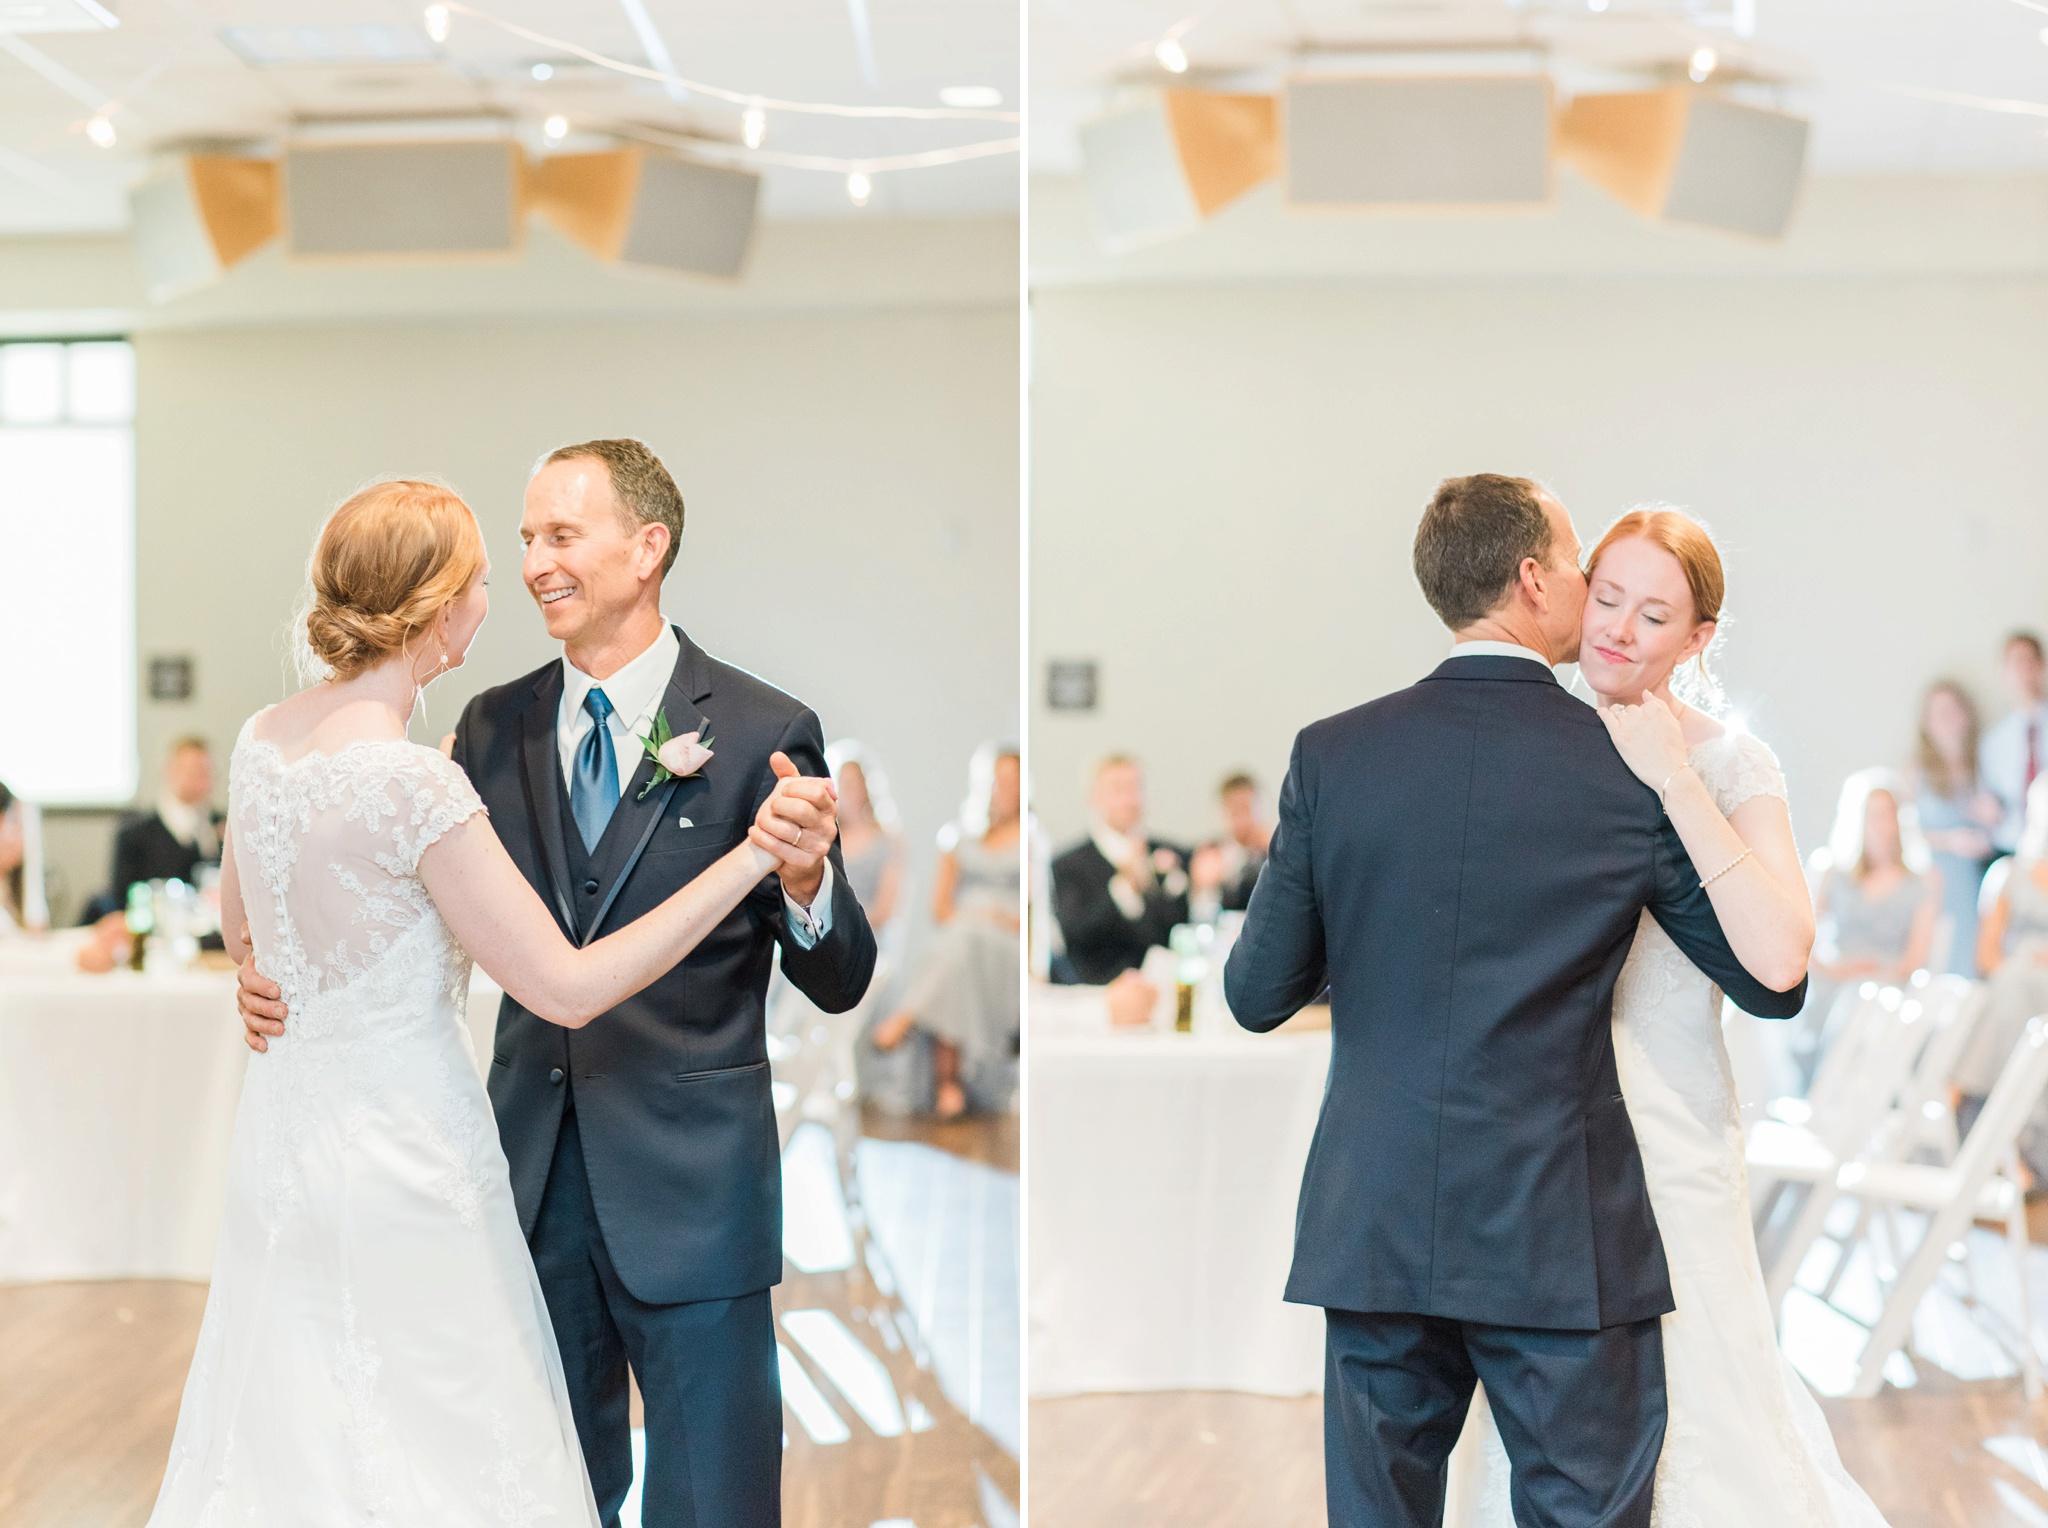 sunbury-ohio-wedding-hannah-johnathan_0140.jpg